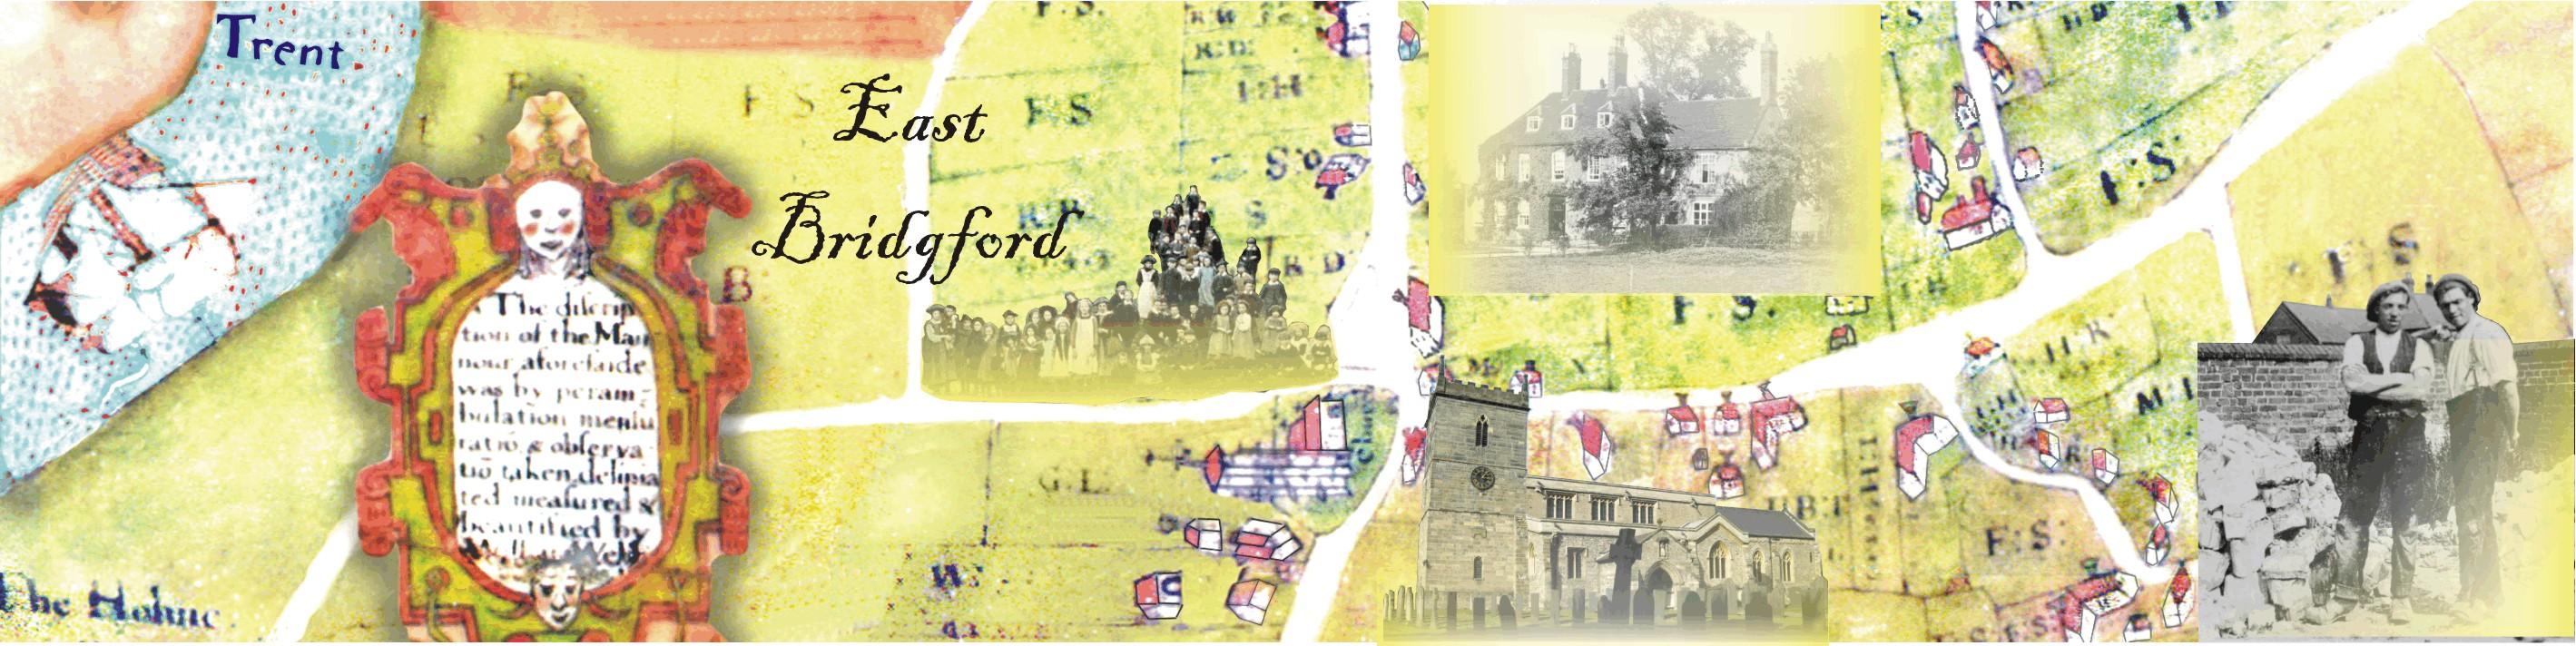 East Bridgford Local History Group